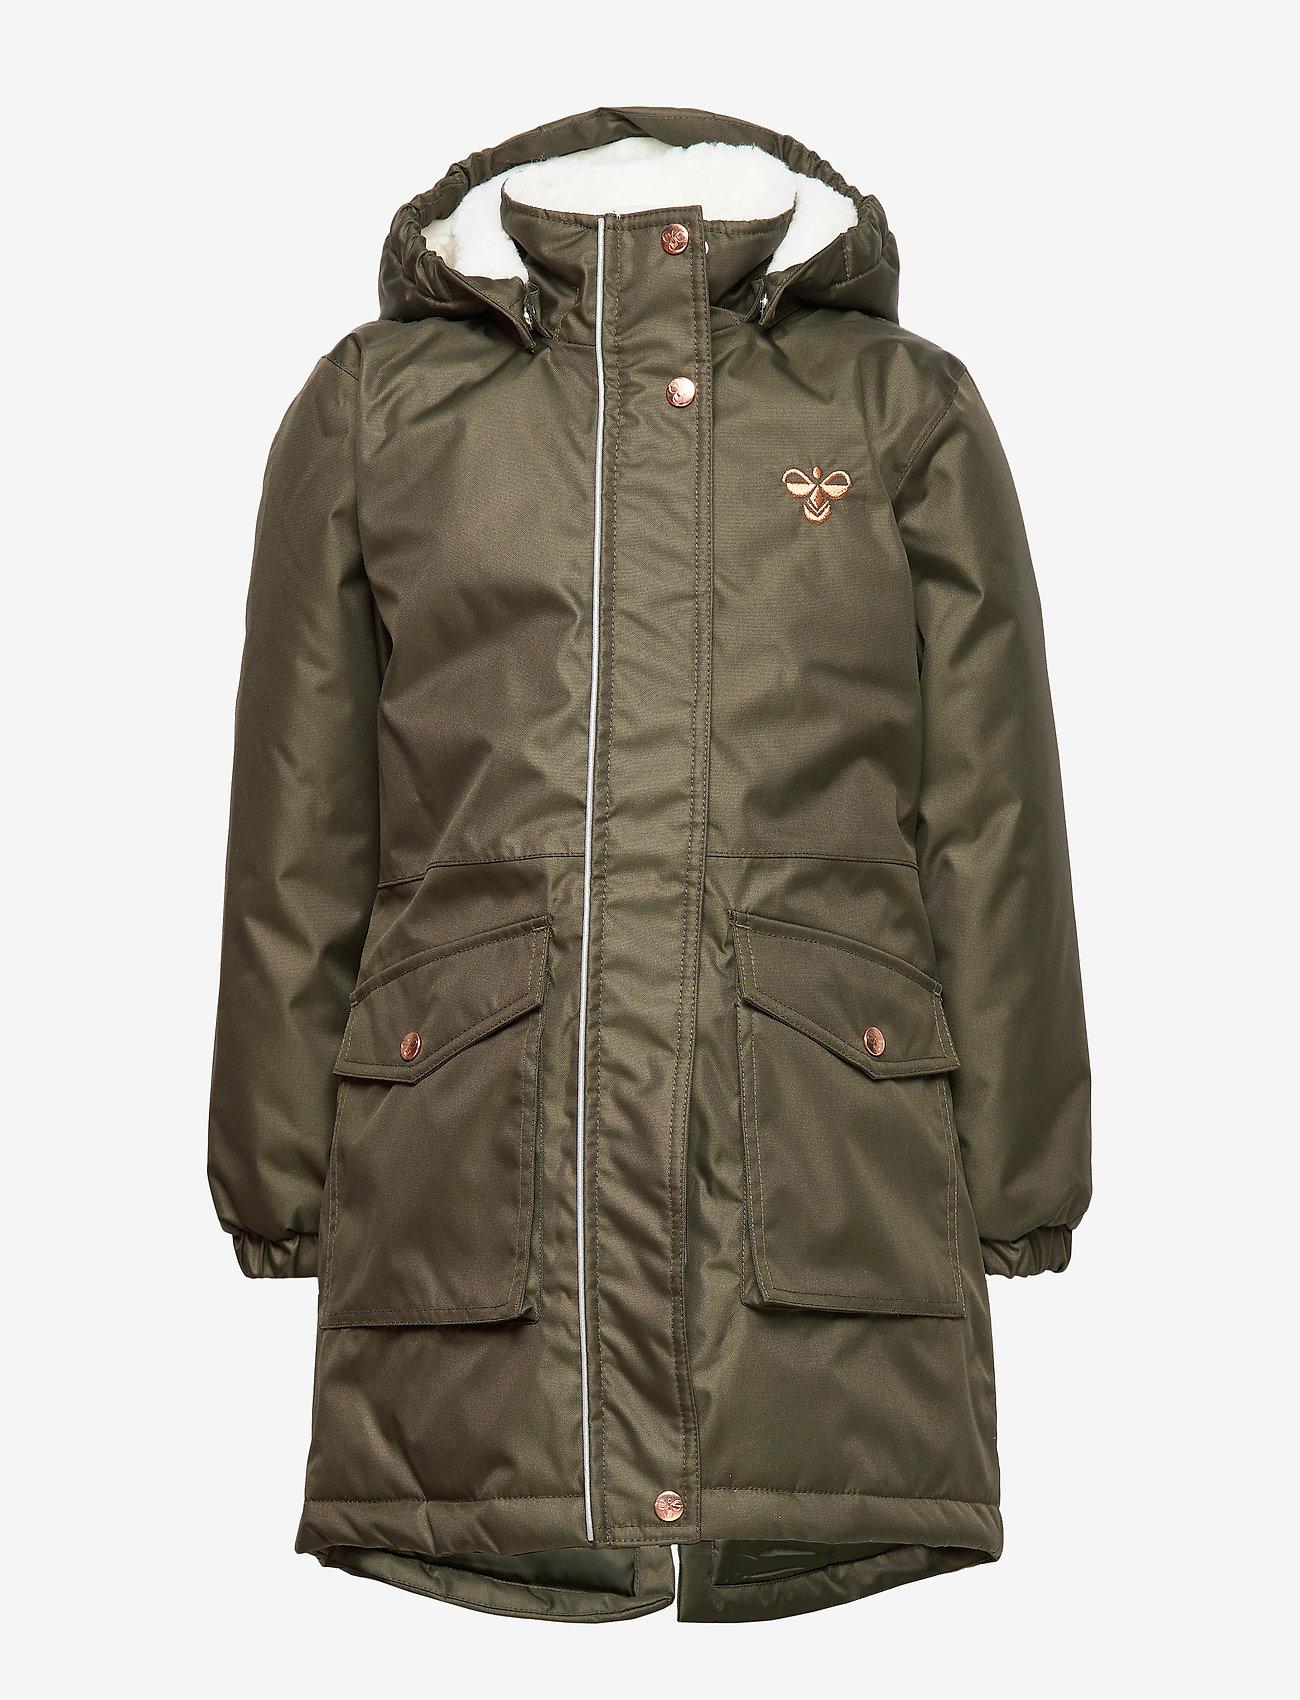 Hummel - hmlLISE COAT - insulated jackets - forest night - 1